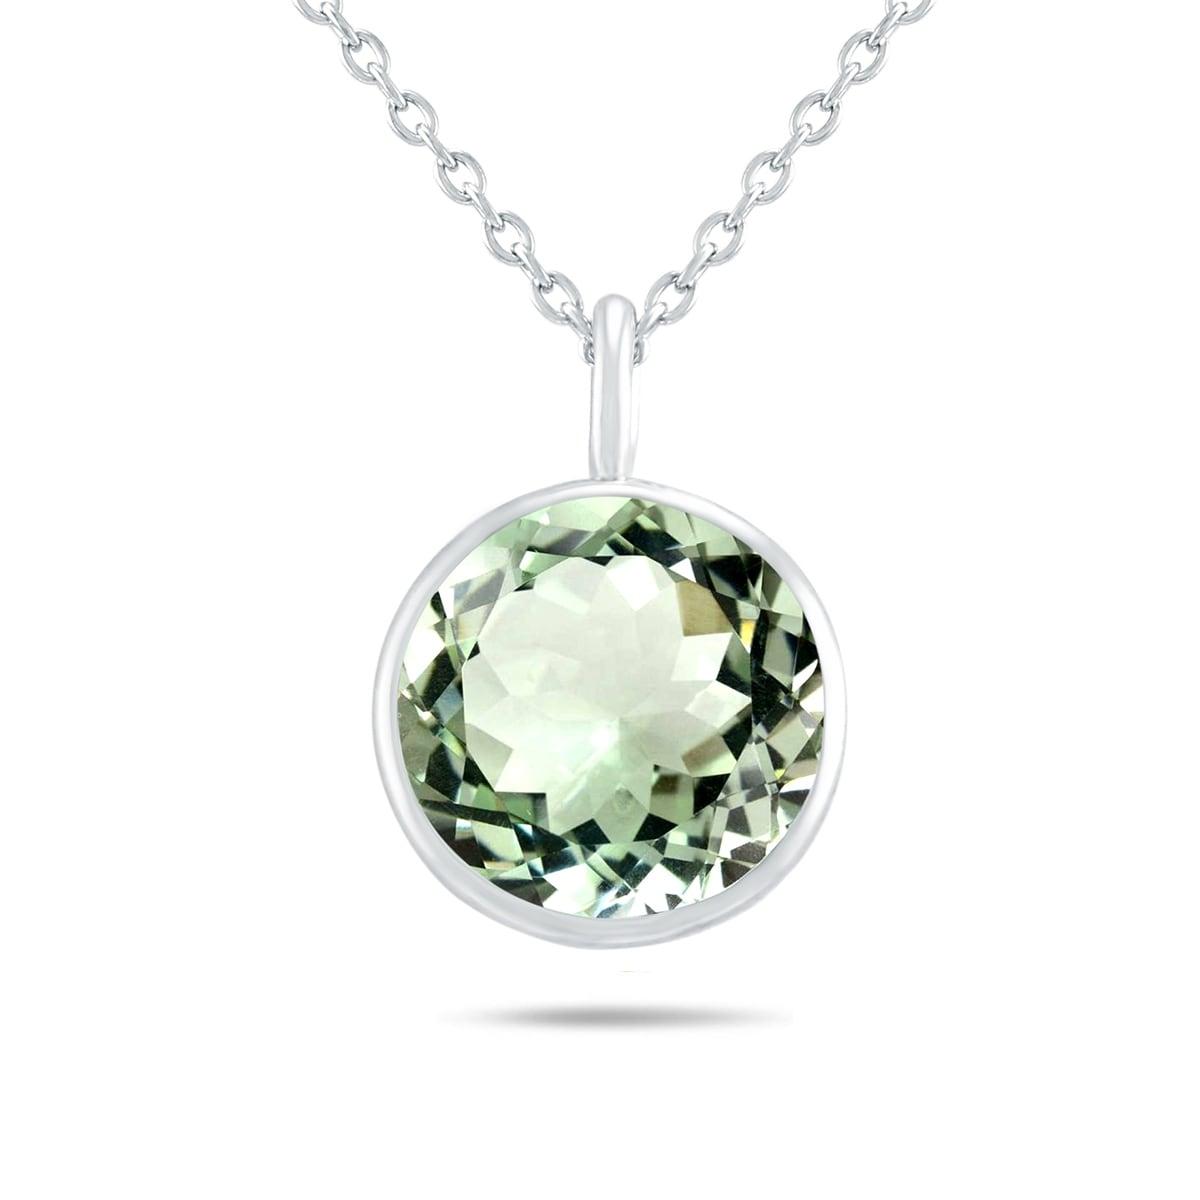 Natural Green Amethyst pear cut pendant in 925 silver